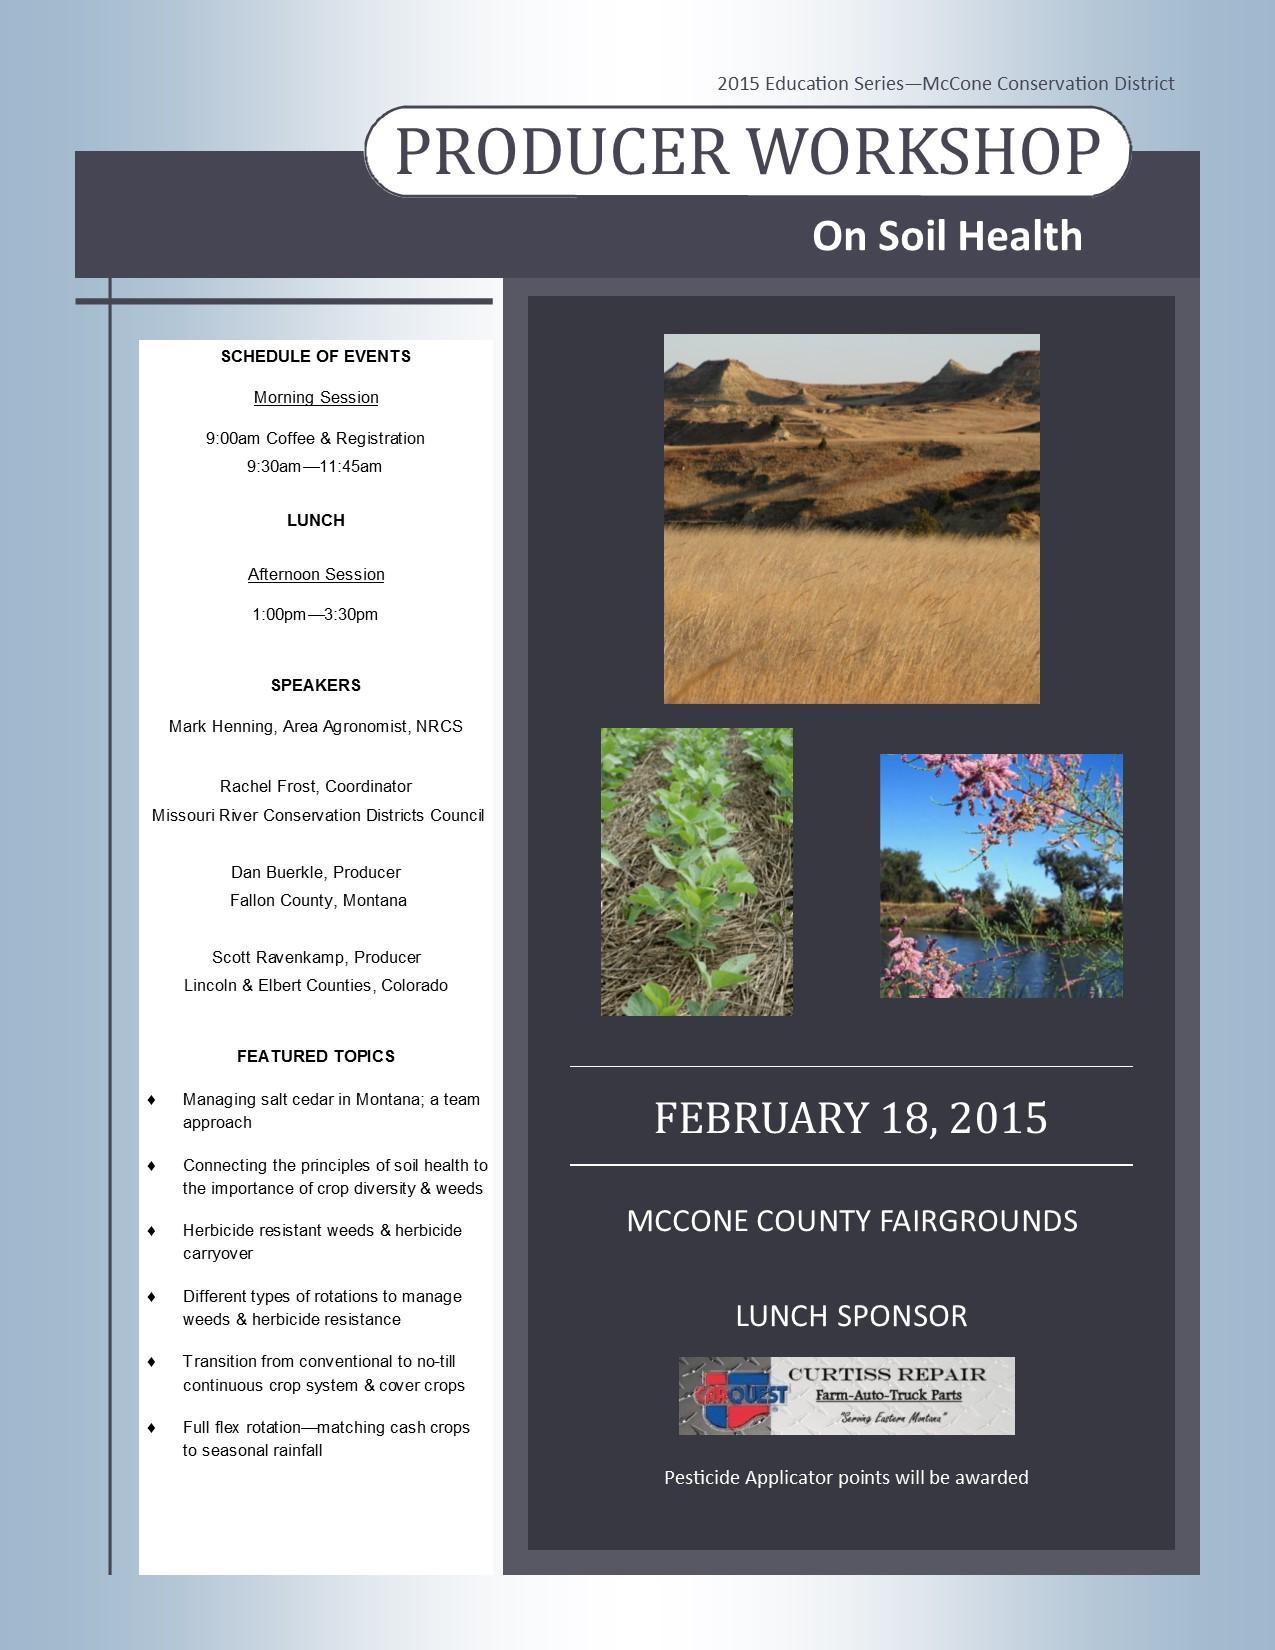 Montana mccone county brockway - Soil Health Workshop February 18 2015